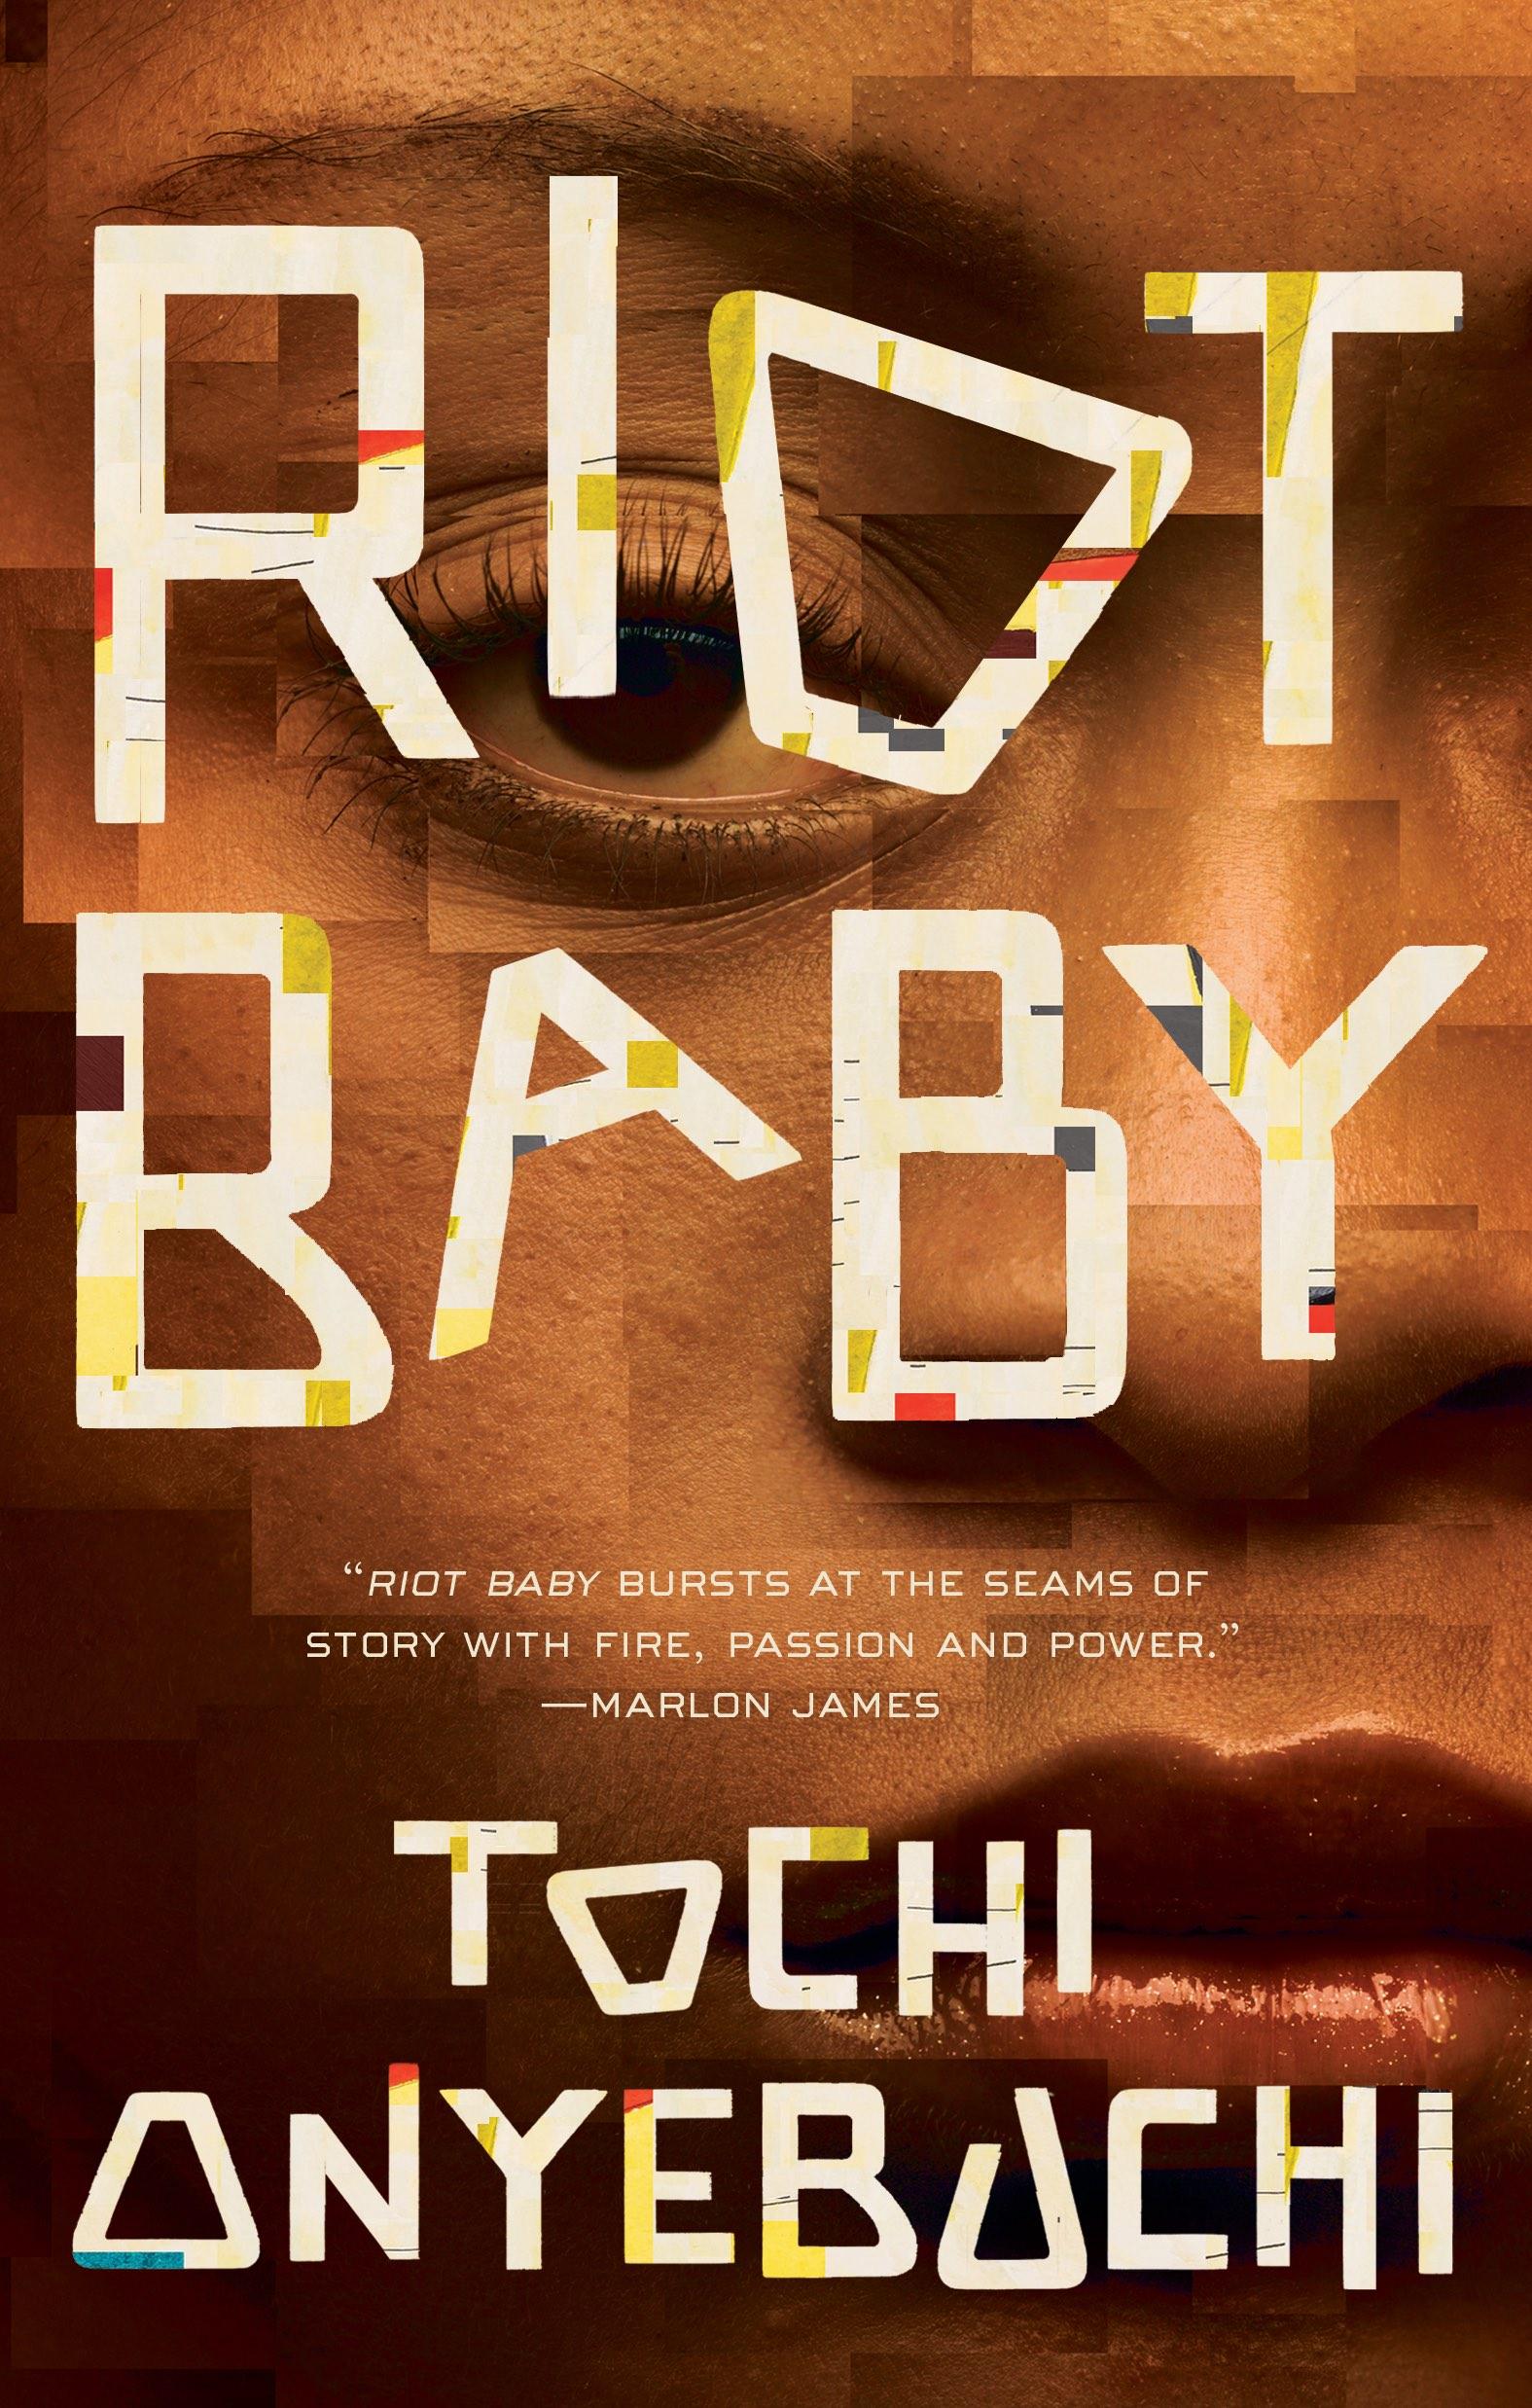 Ignite the Future: Revealing Riot Baby by Tochi Onyebuchi